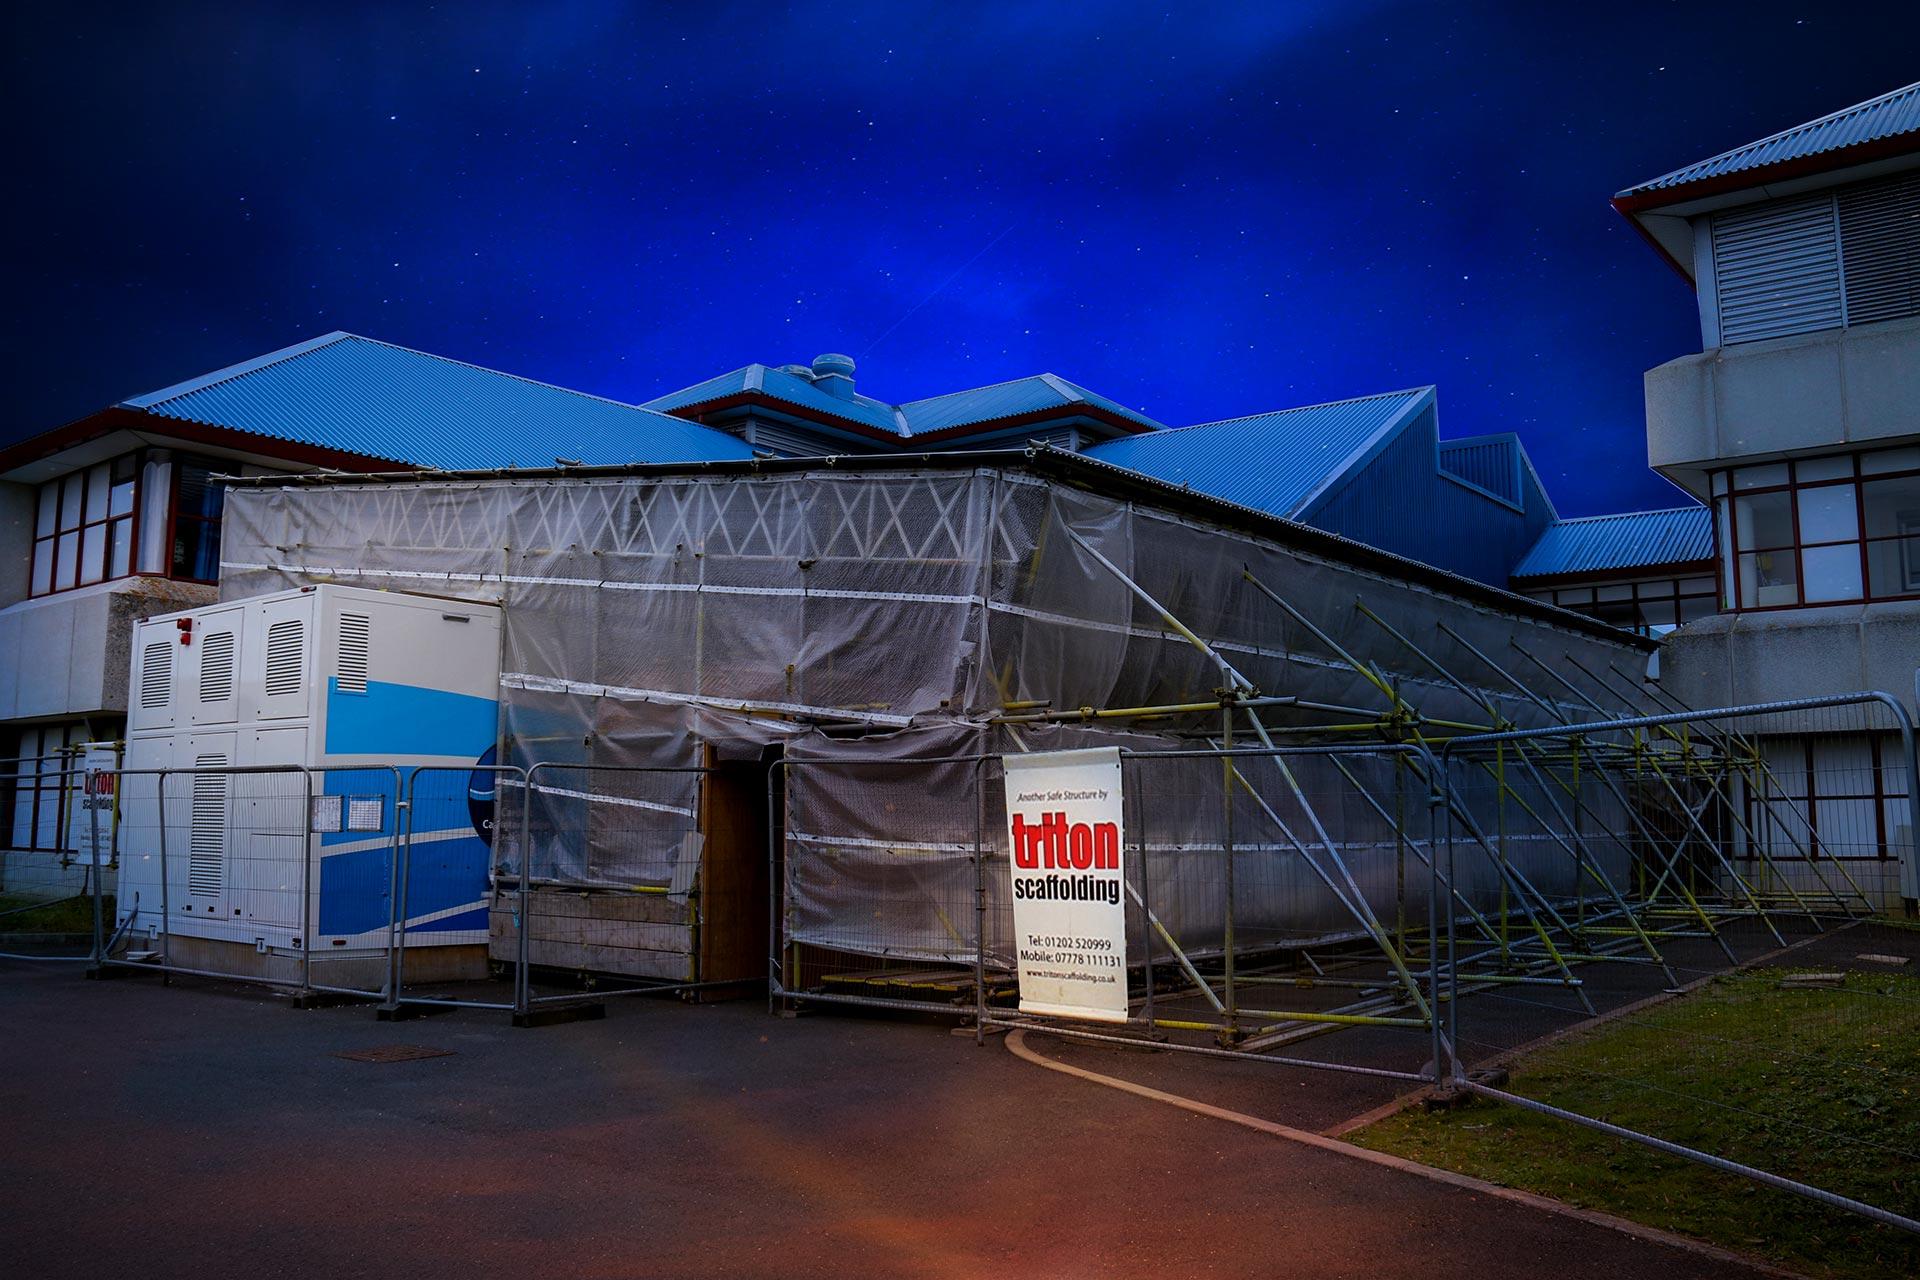 Temporary Roofing at Bournemouth Hospital - Triton Scaffolding Ltd - Slideshow Photo